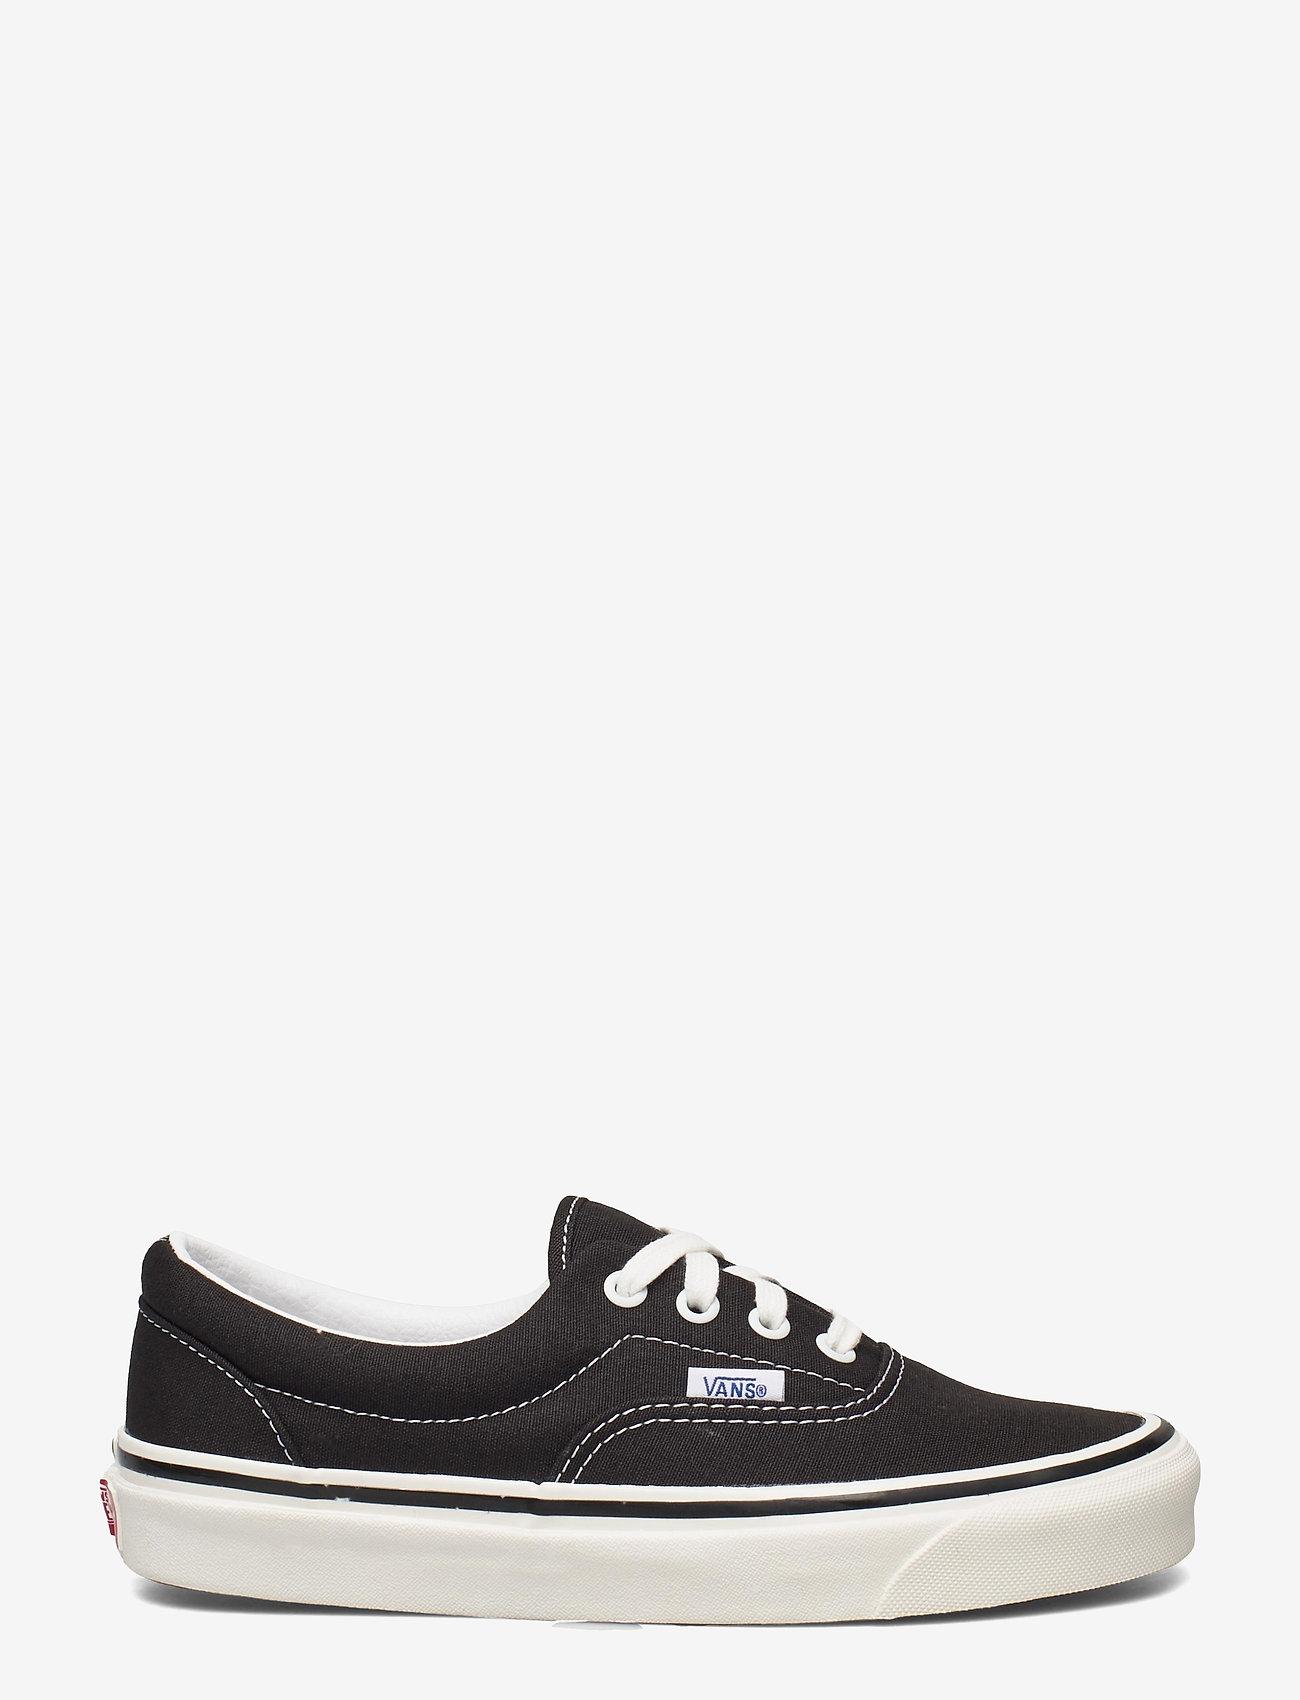 VANS - Shoe Adult Unisex Numeric Wid - laag sneakers - (anaheim factory) og blac - 1